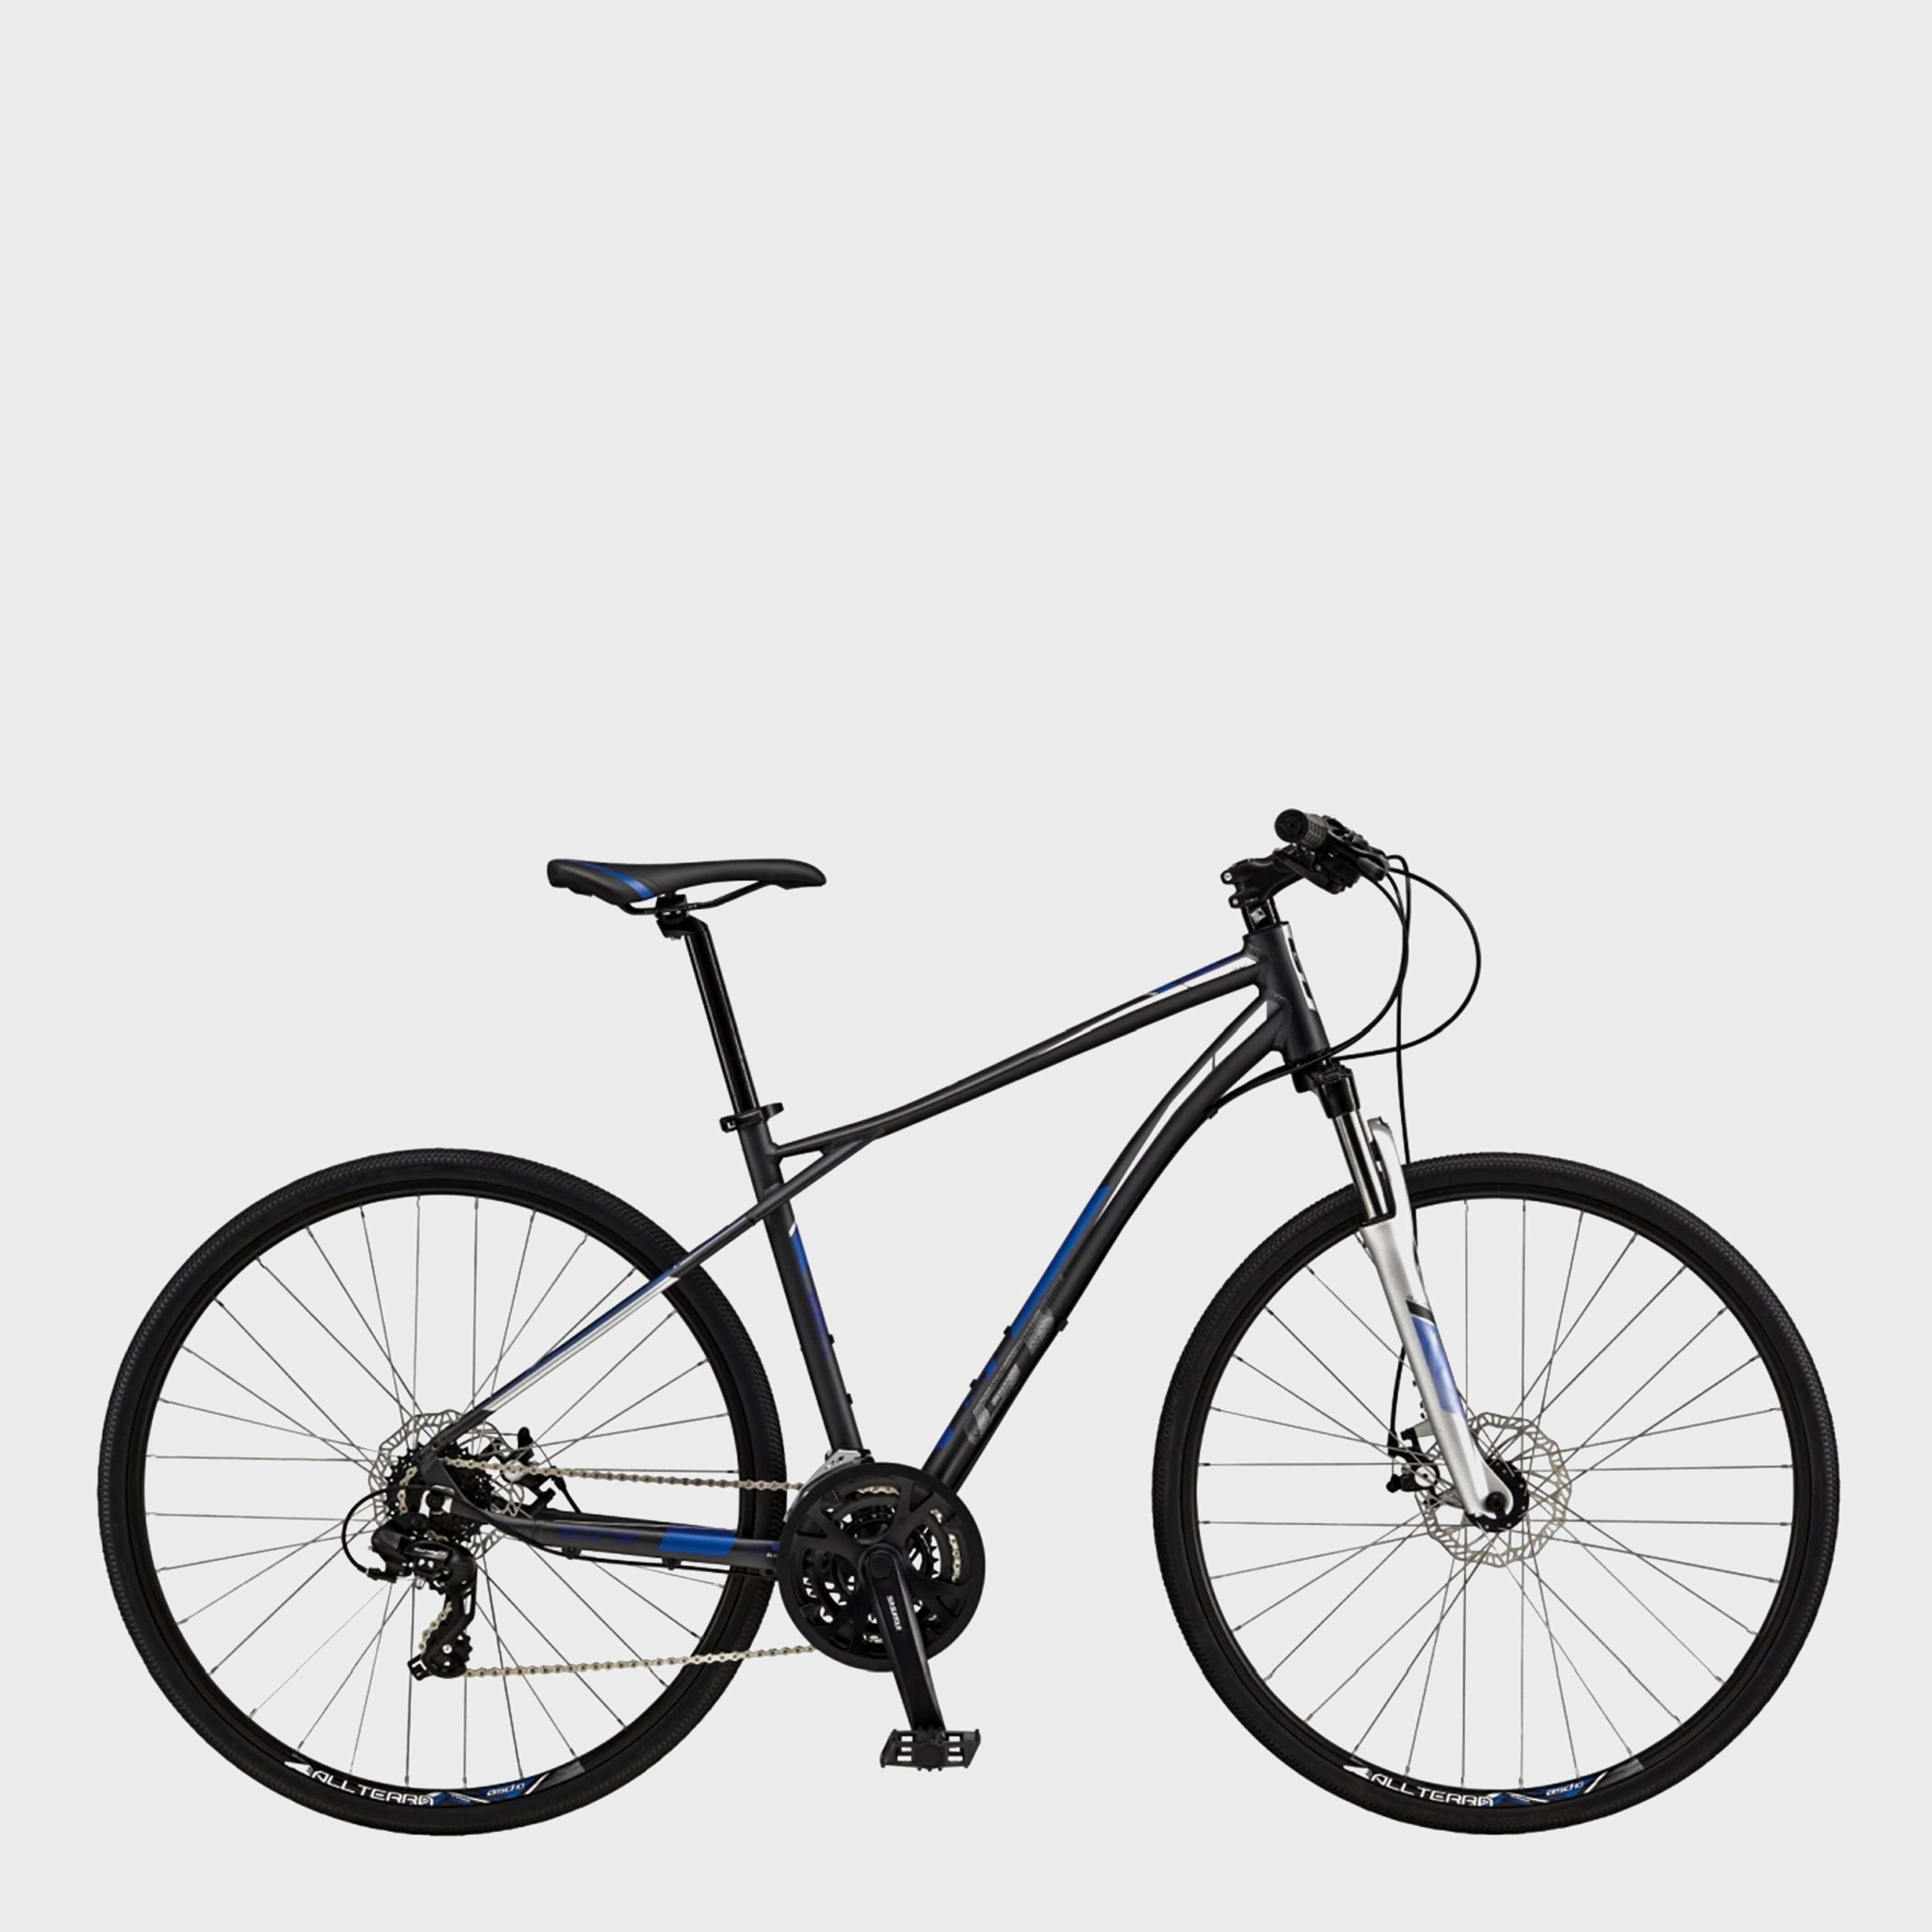 GT Transeo 5.0 Bike